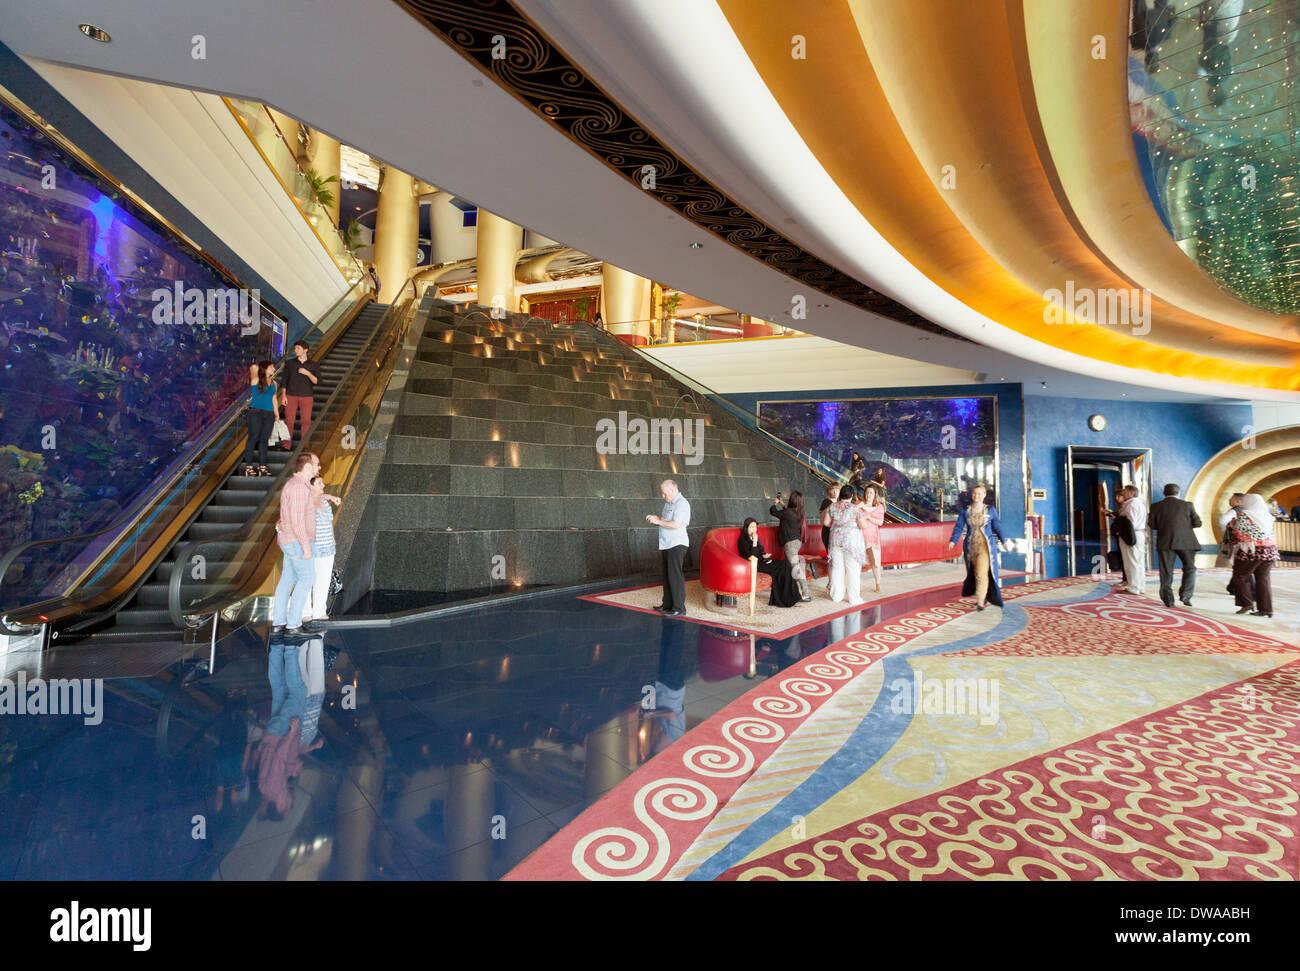 Burj al arab hotel dubai ornate 7 star luxurious for Dubai hotels 7 star interior